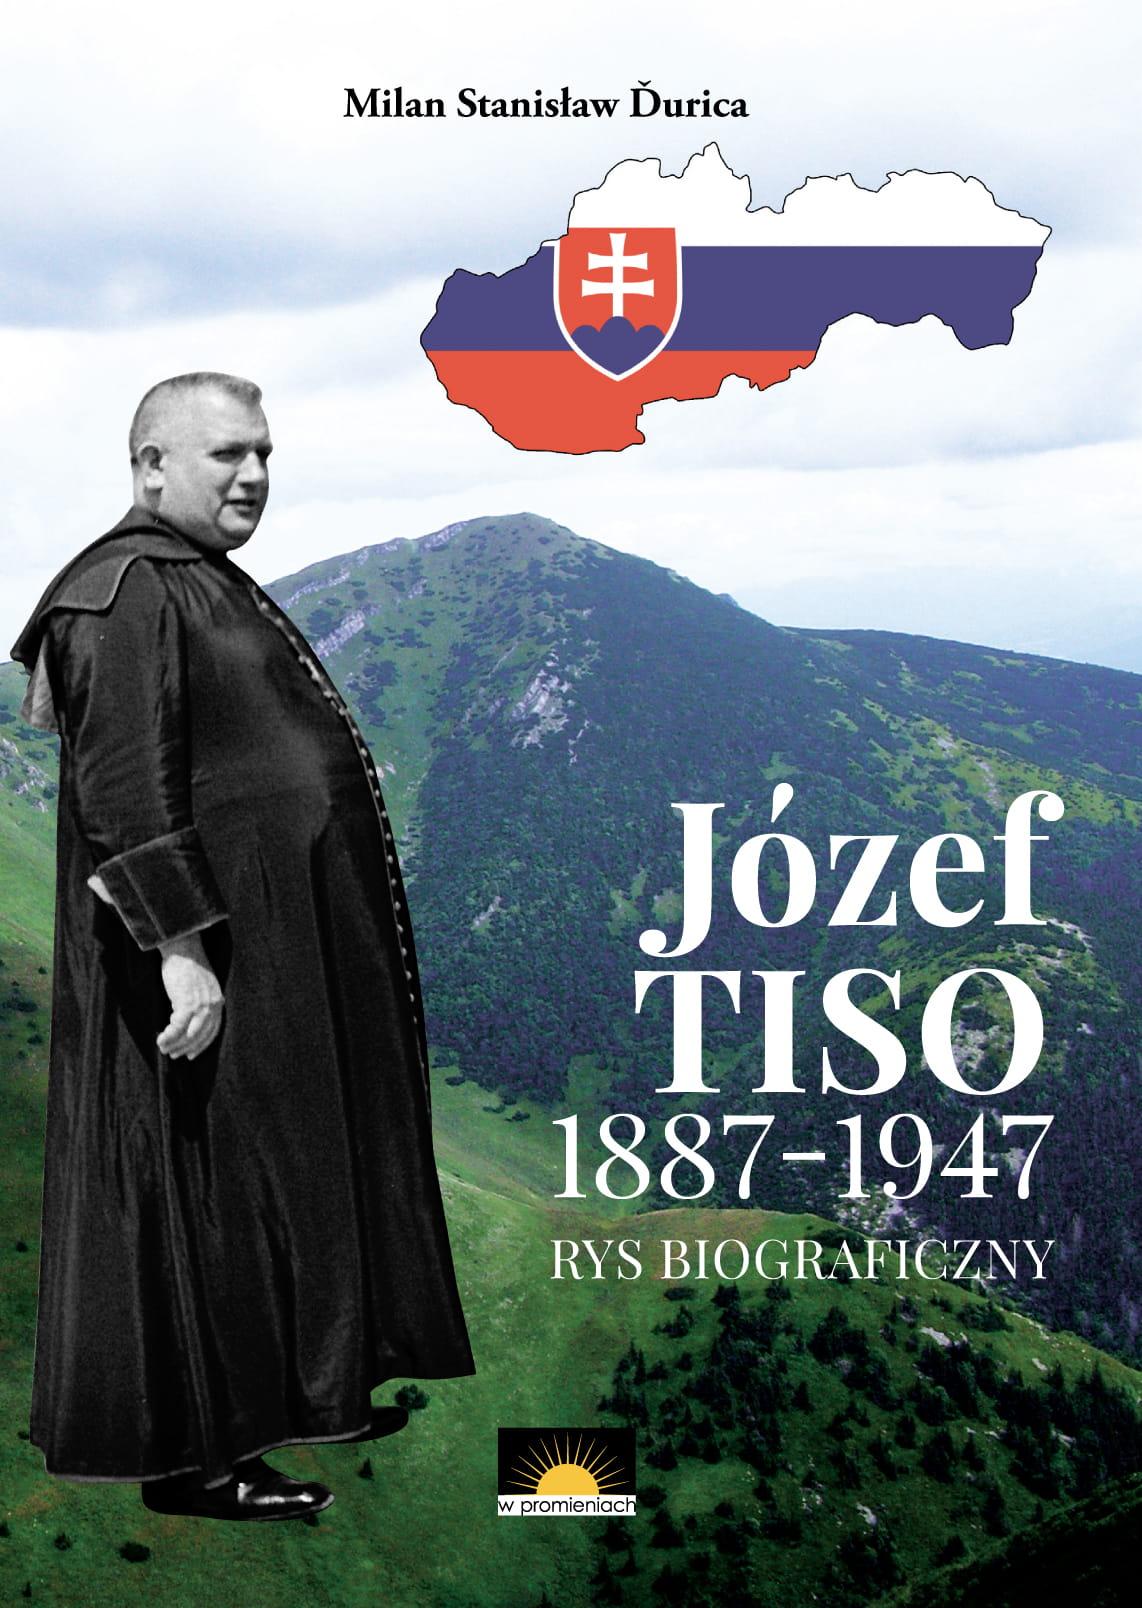 Józef Tiso 1887-1947 Rys biograficzny (M.St.Durica)